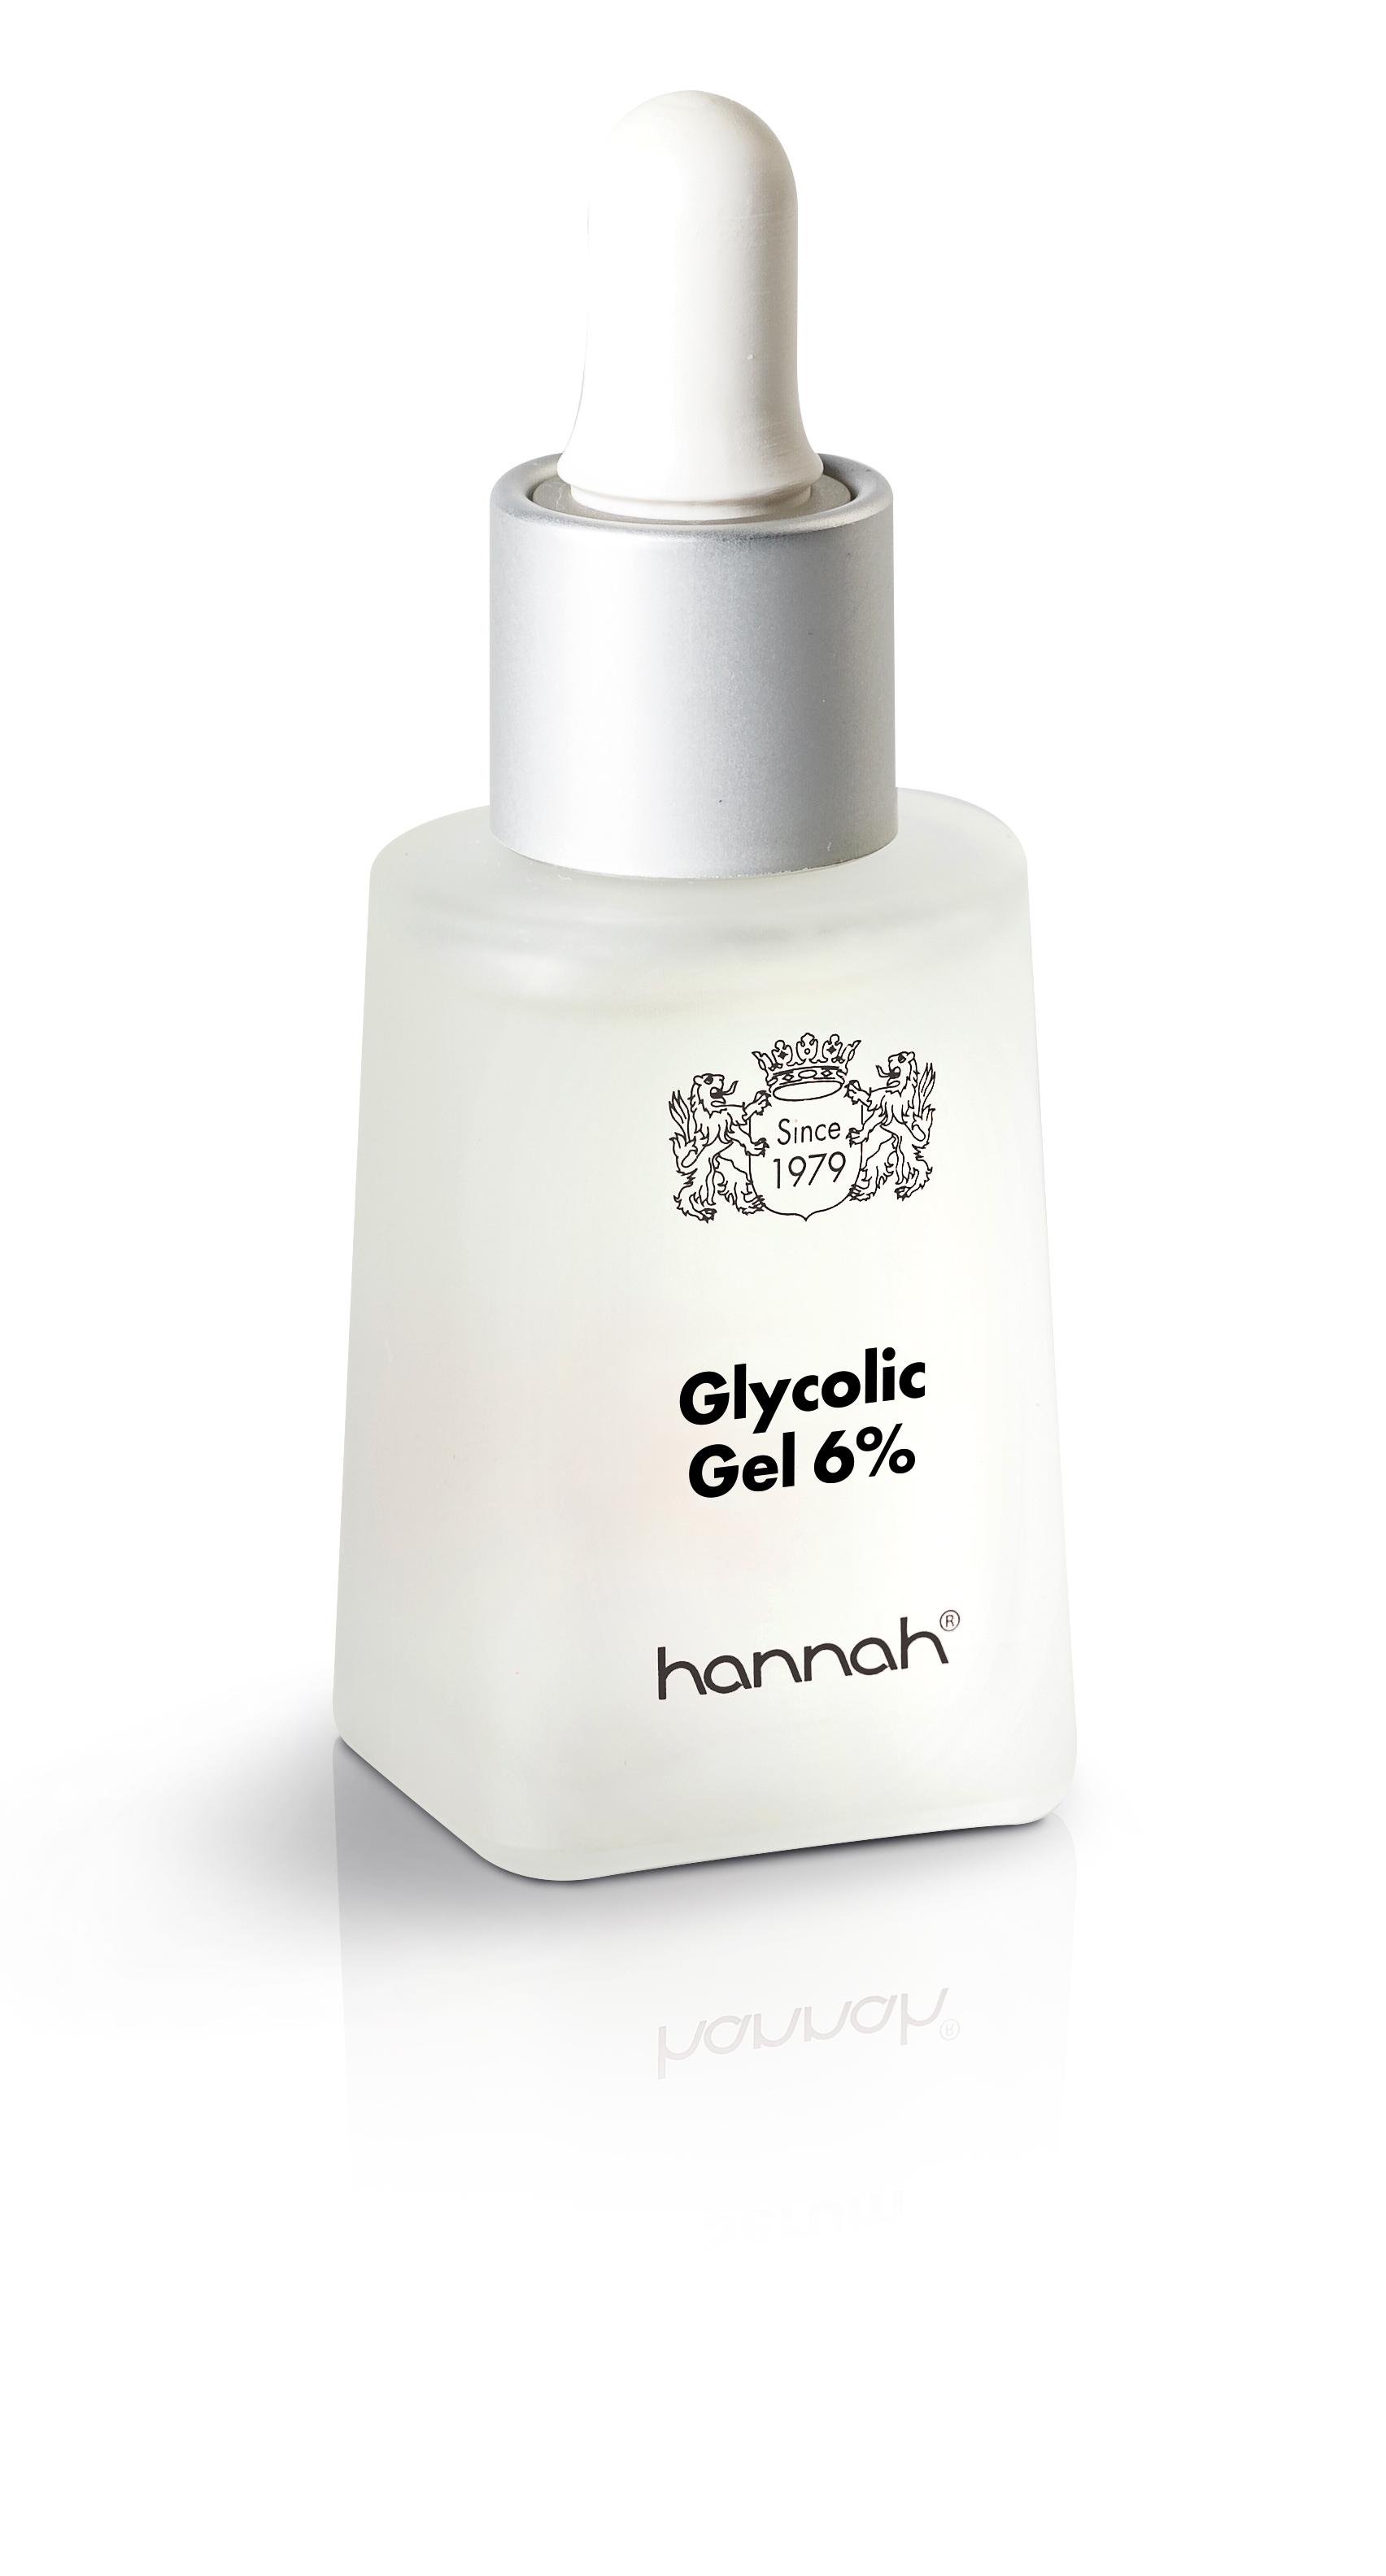 hannah Glycolic 6% 30ml